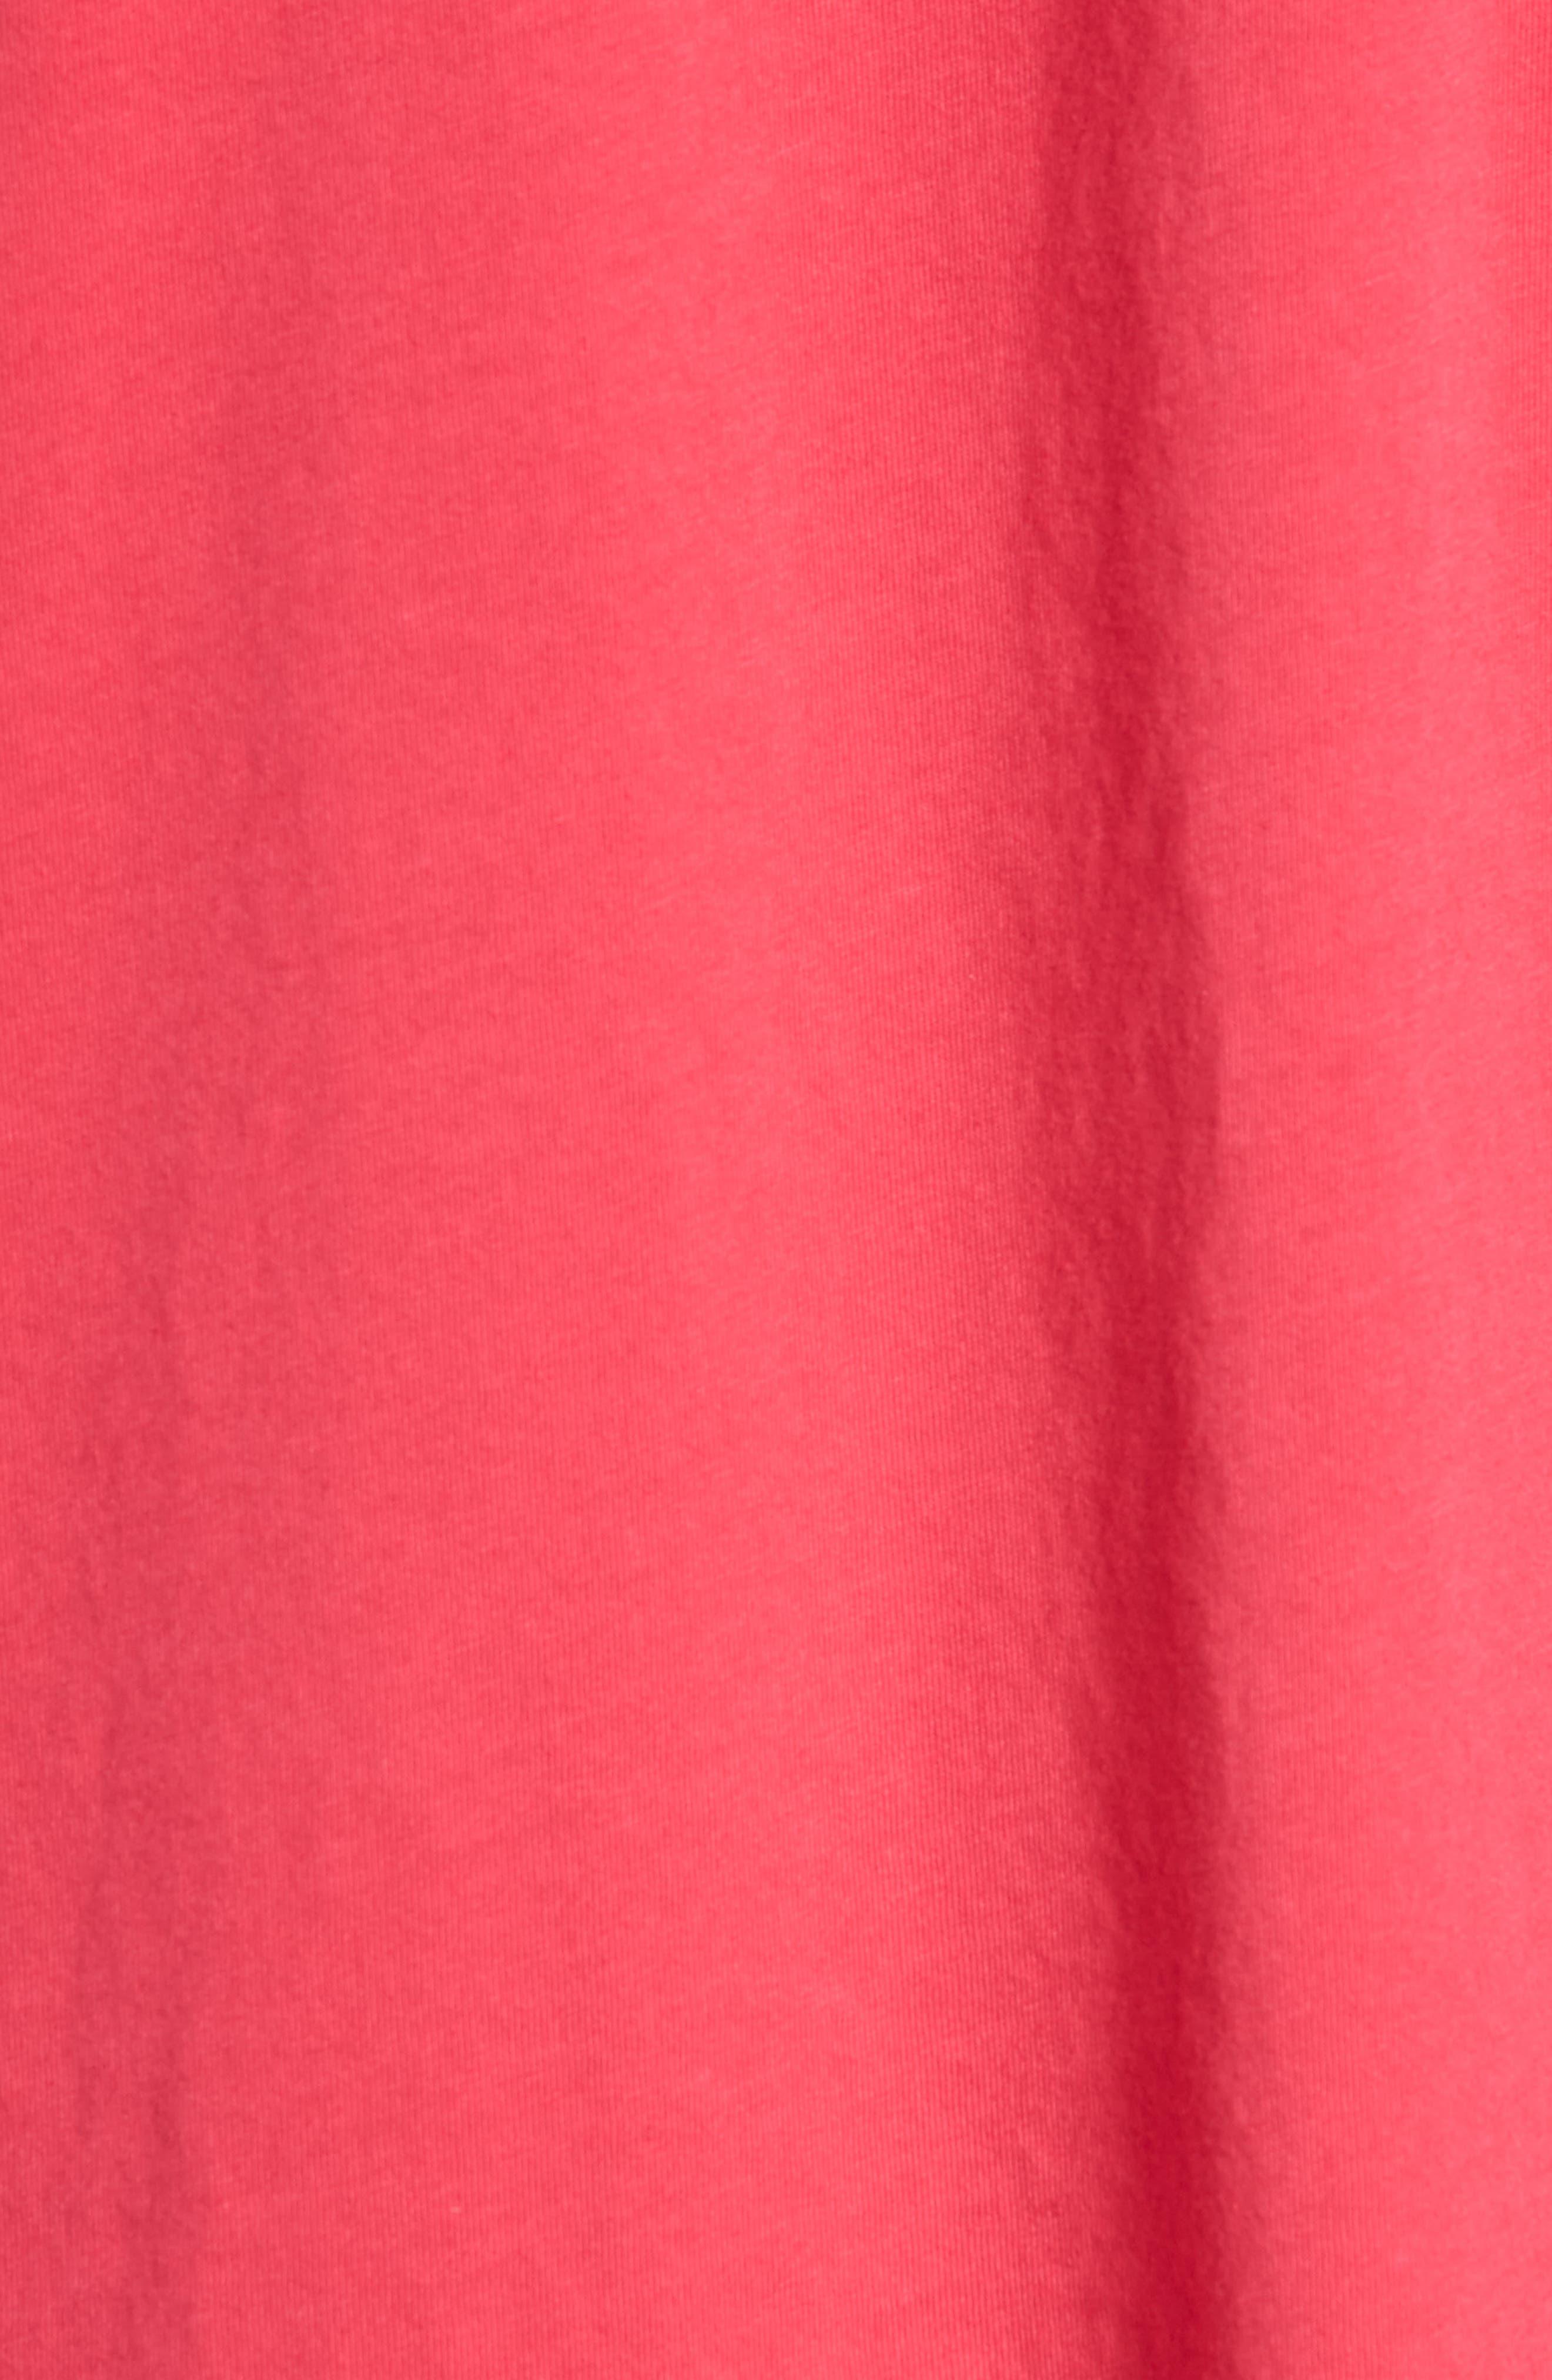 Generation Appropriation Crewneck T-Shirt,                             Alternate thumbnail 5, color,                             Punk Pink